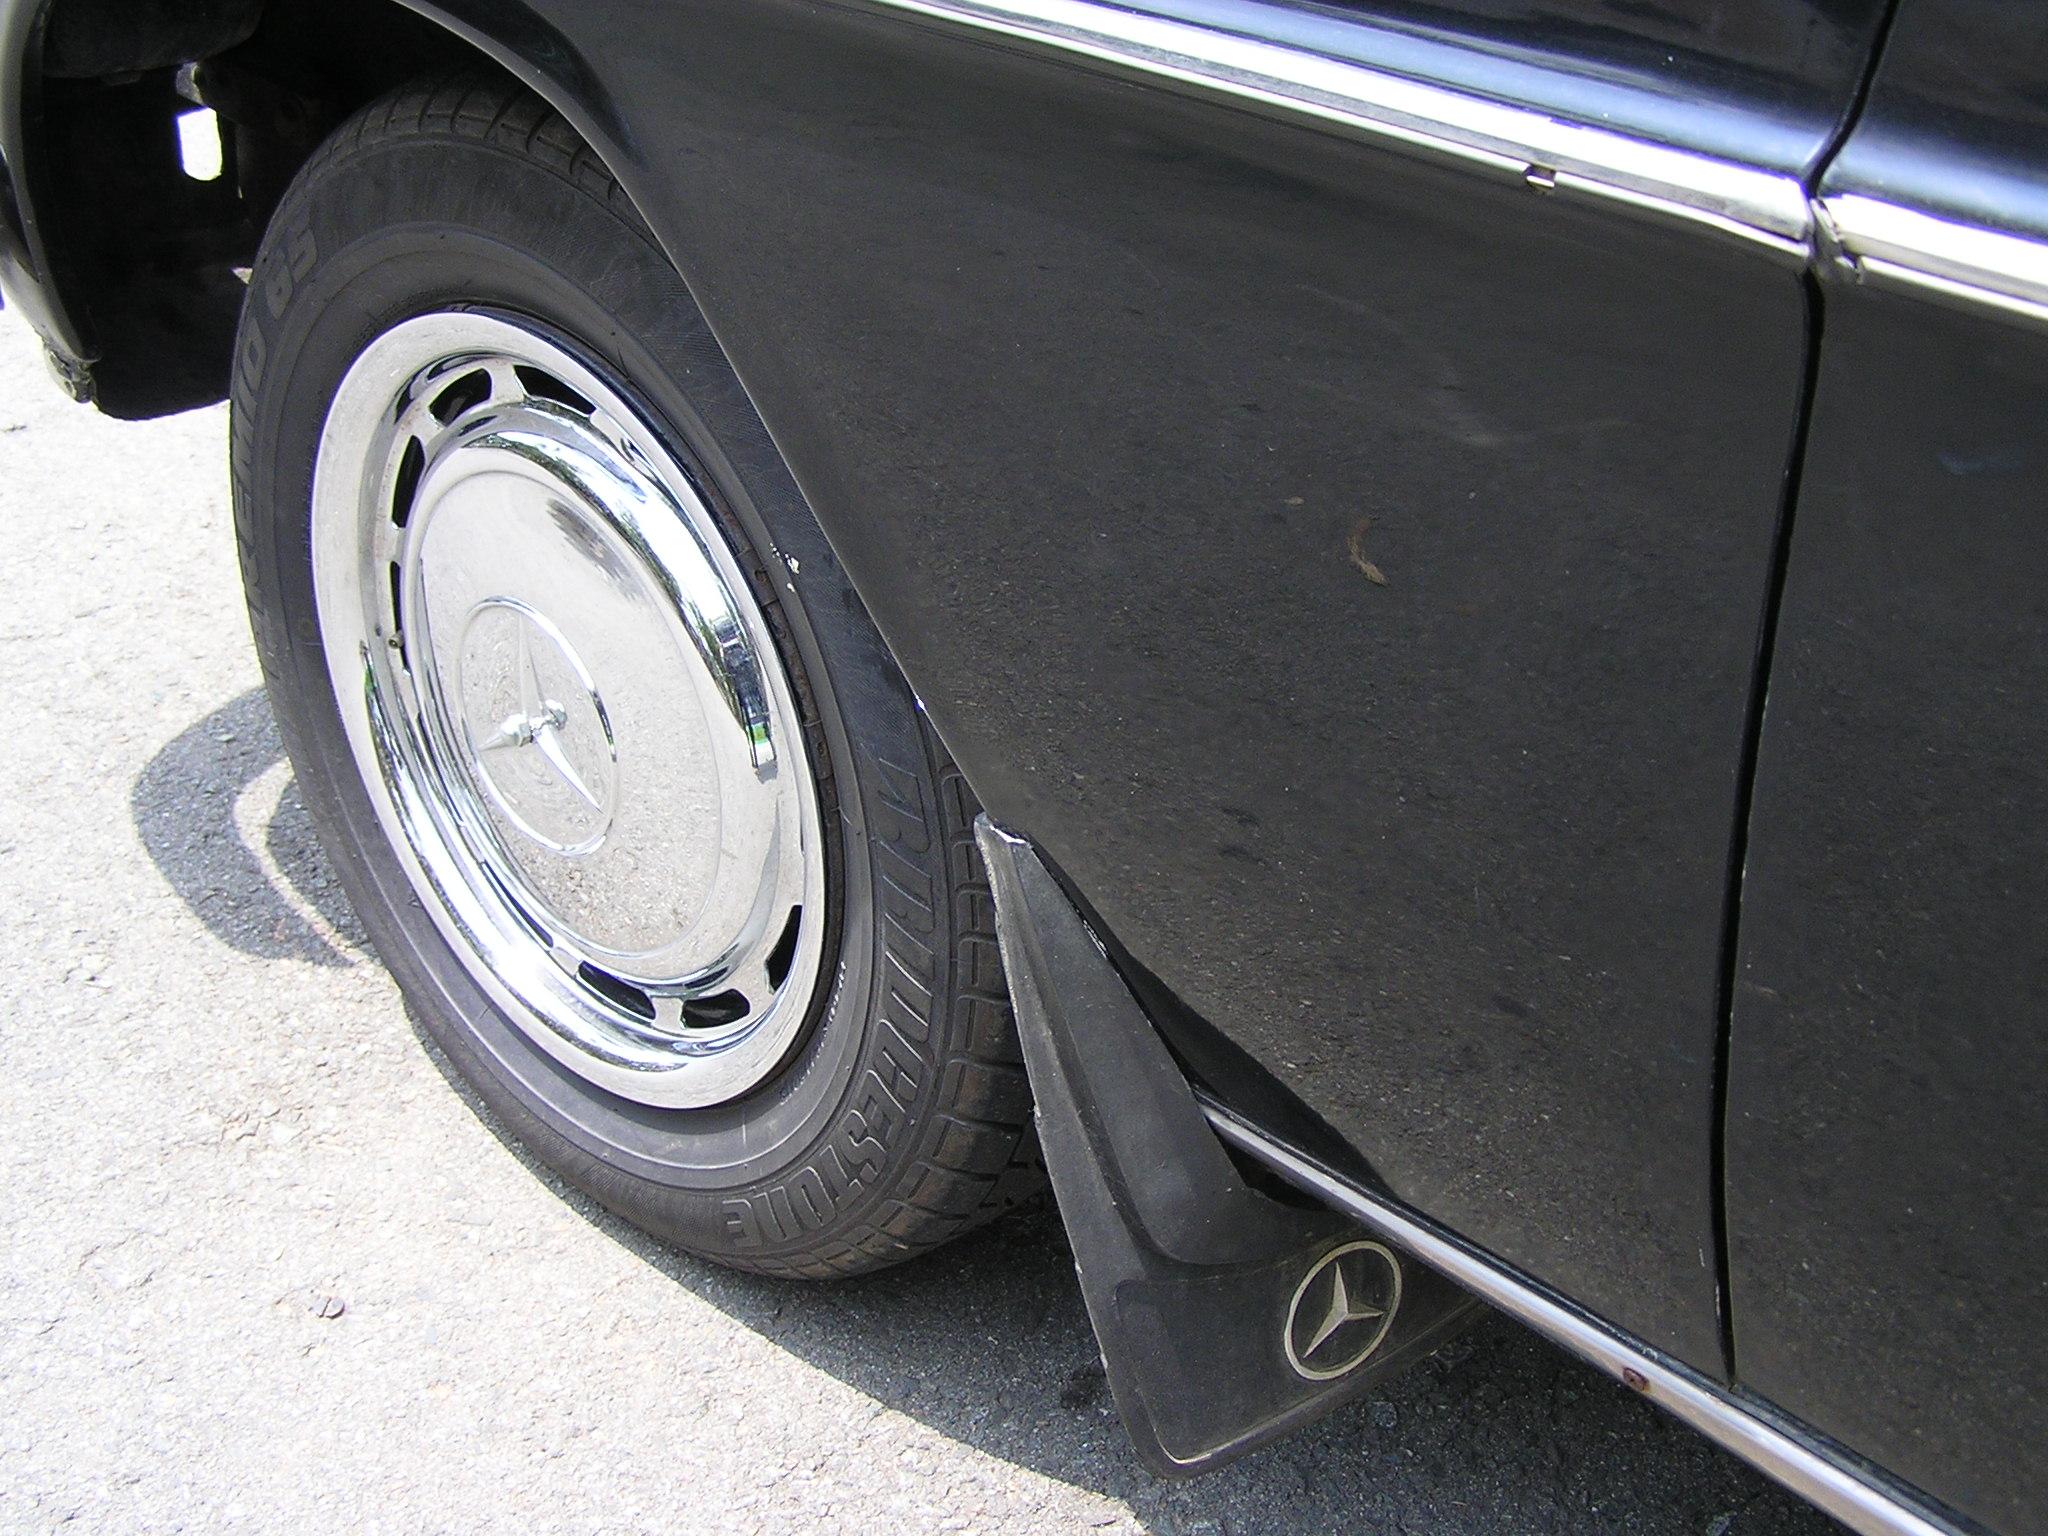 Trai-nghiem-qua-khu-ngot-ngao-tren-Mercedes-Benz-Limousine-230E-1969-anh-13